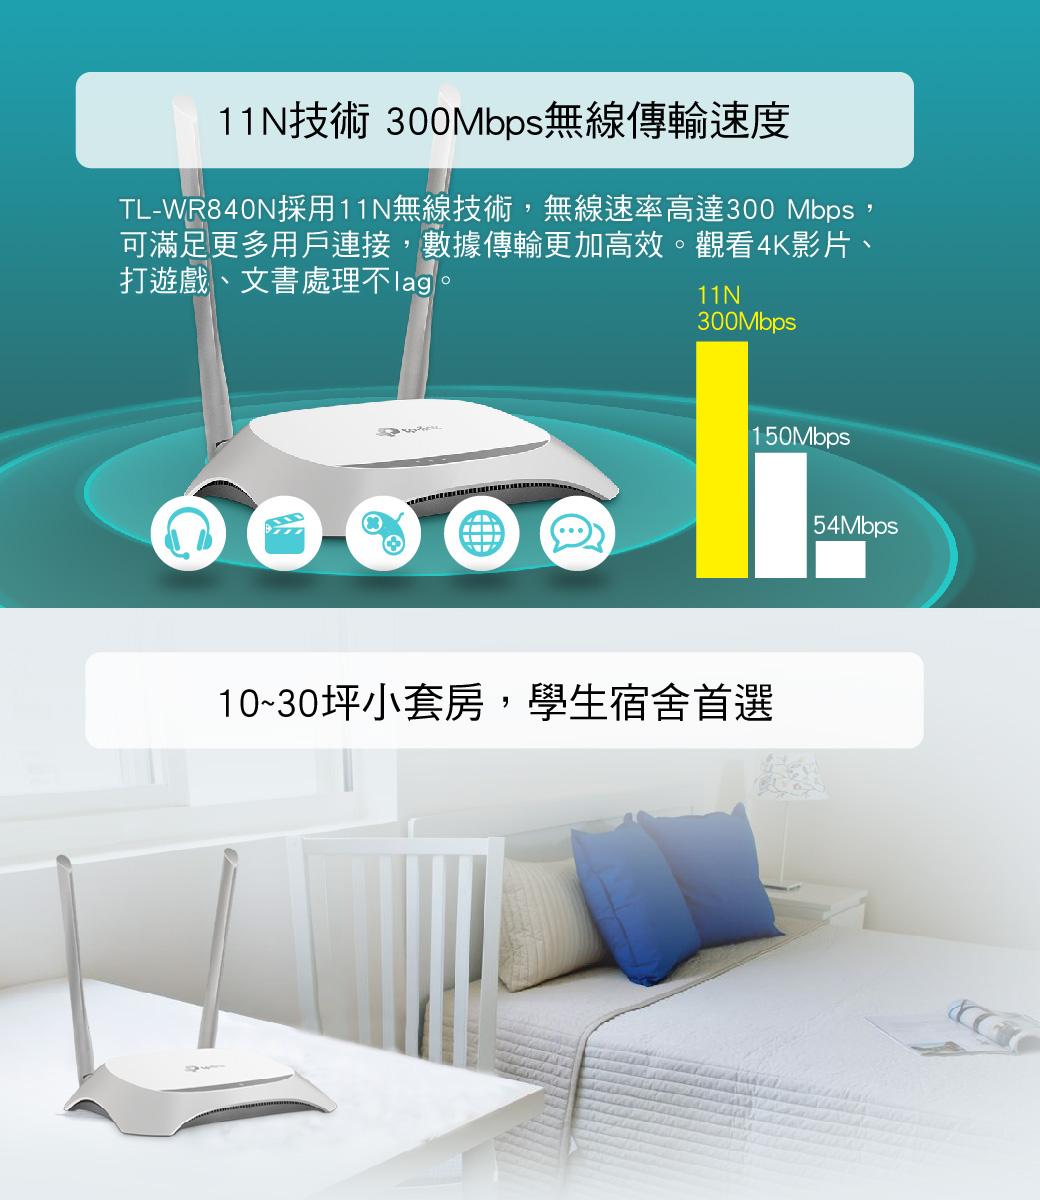 Tp Link Tl Wr840n 300m Ntl Wr840ntw 3 Wr 840n Wireless Router Tplink 300mbps